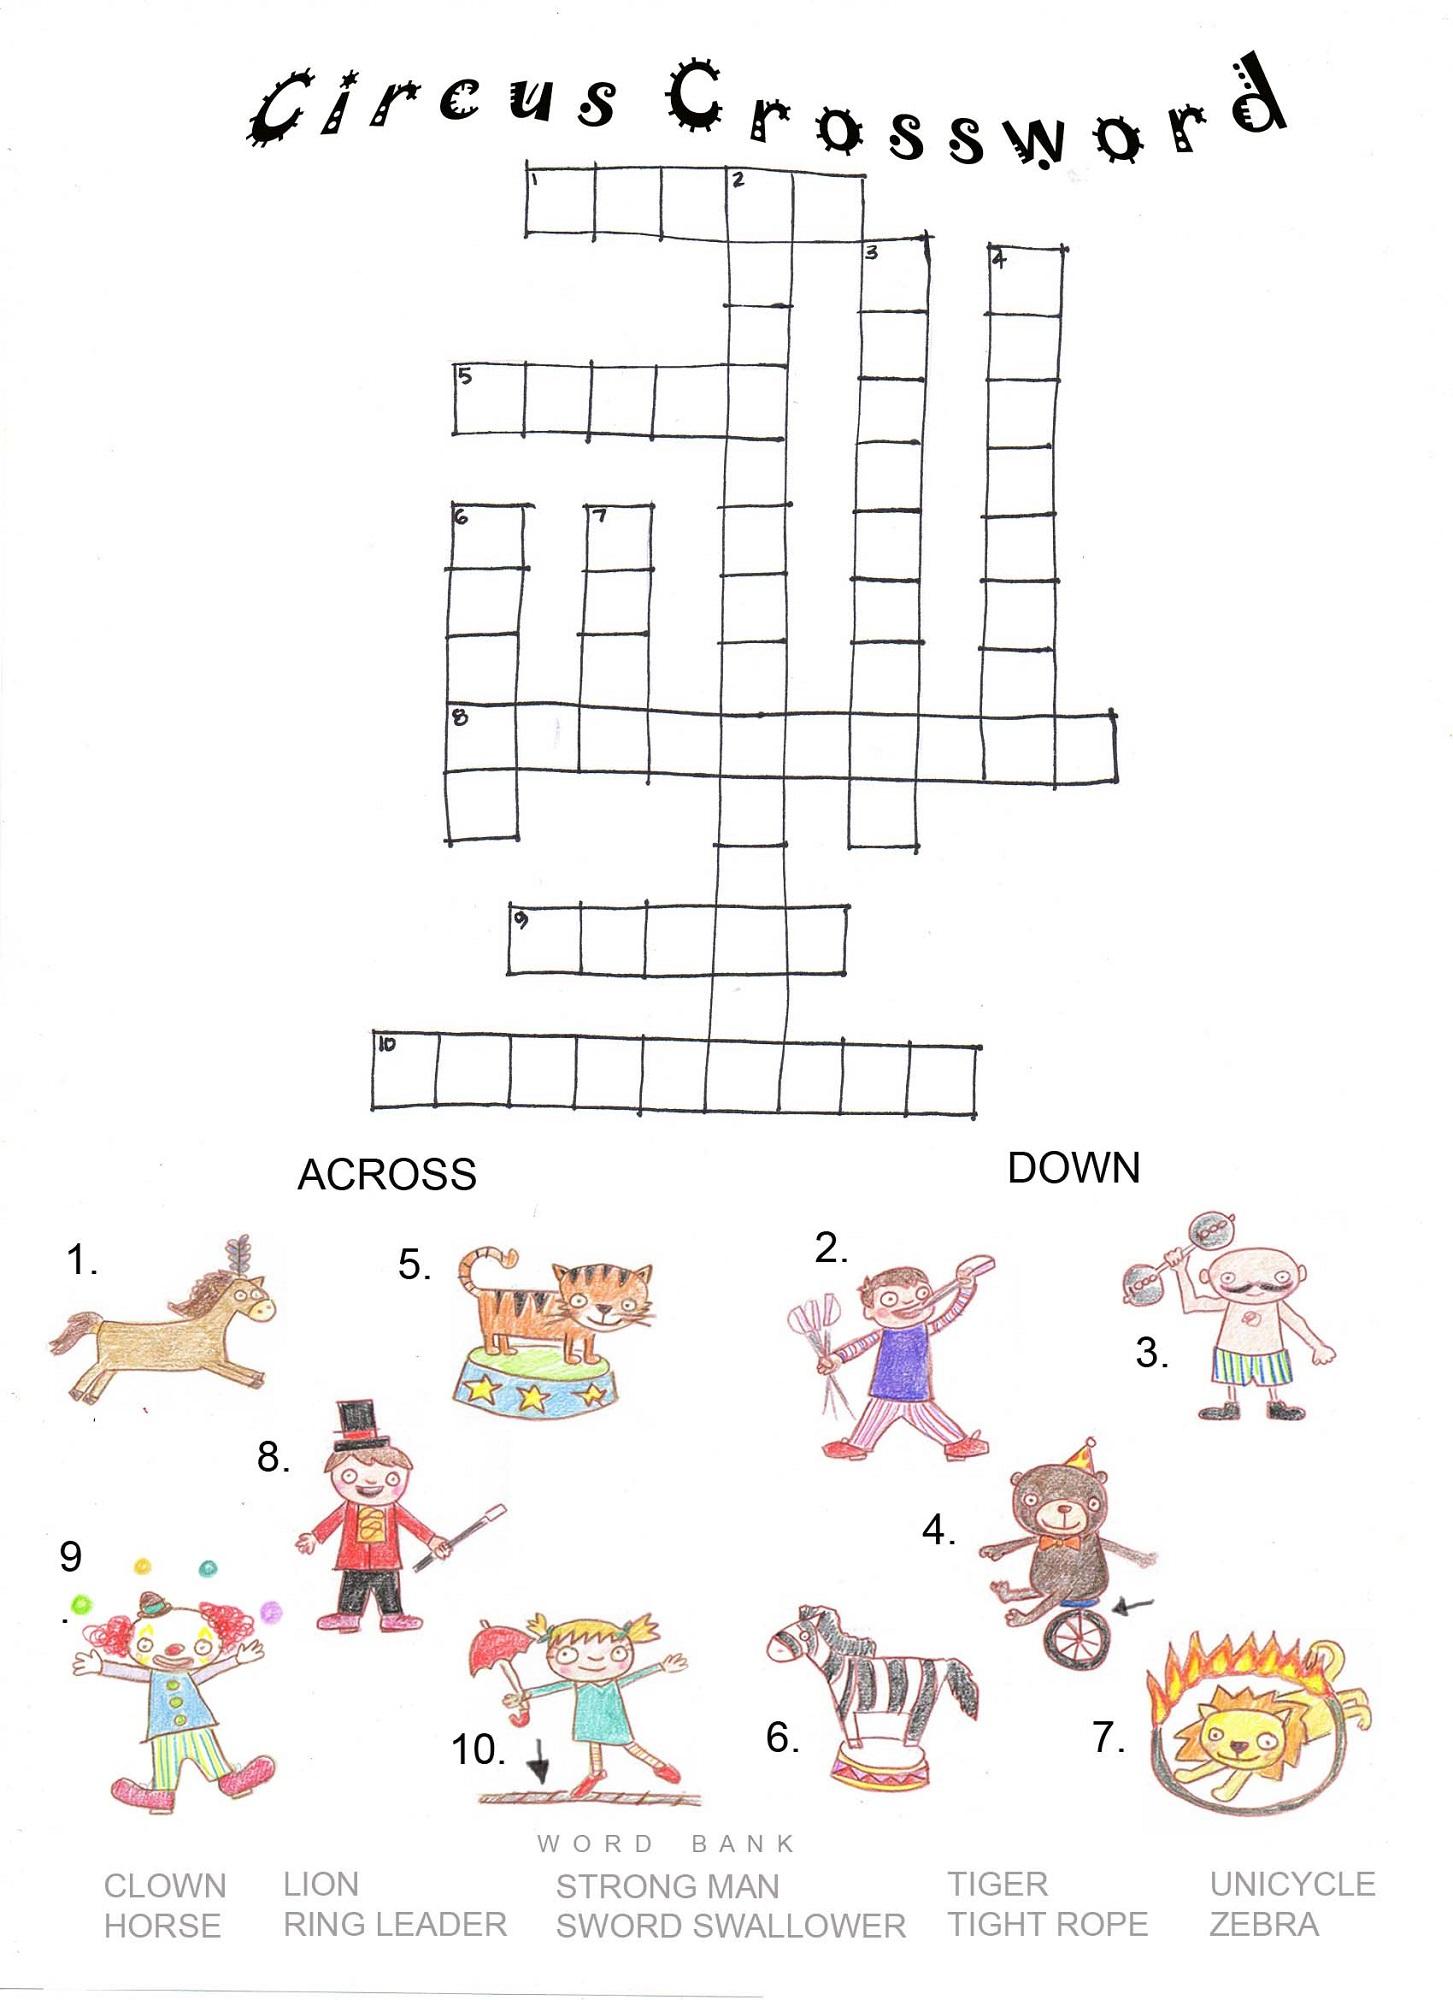 Printable Crosswords Puzzles Kids | Activity Shelter - Printable Crossword Puzzles For Preschoolers